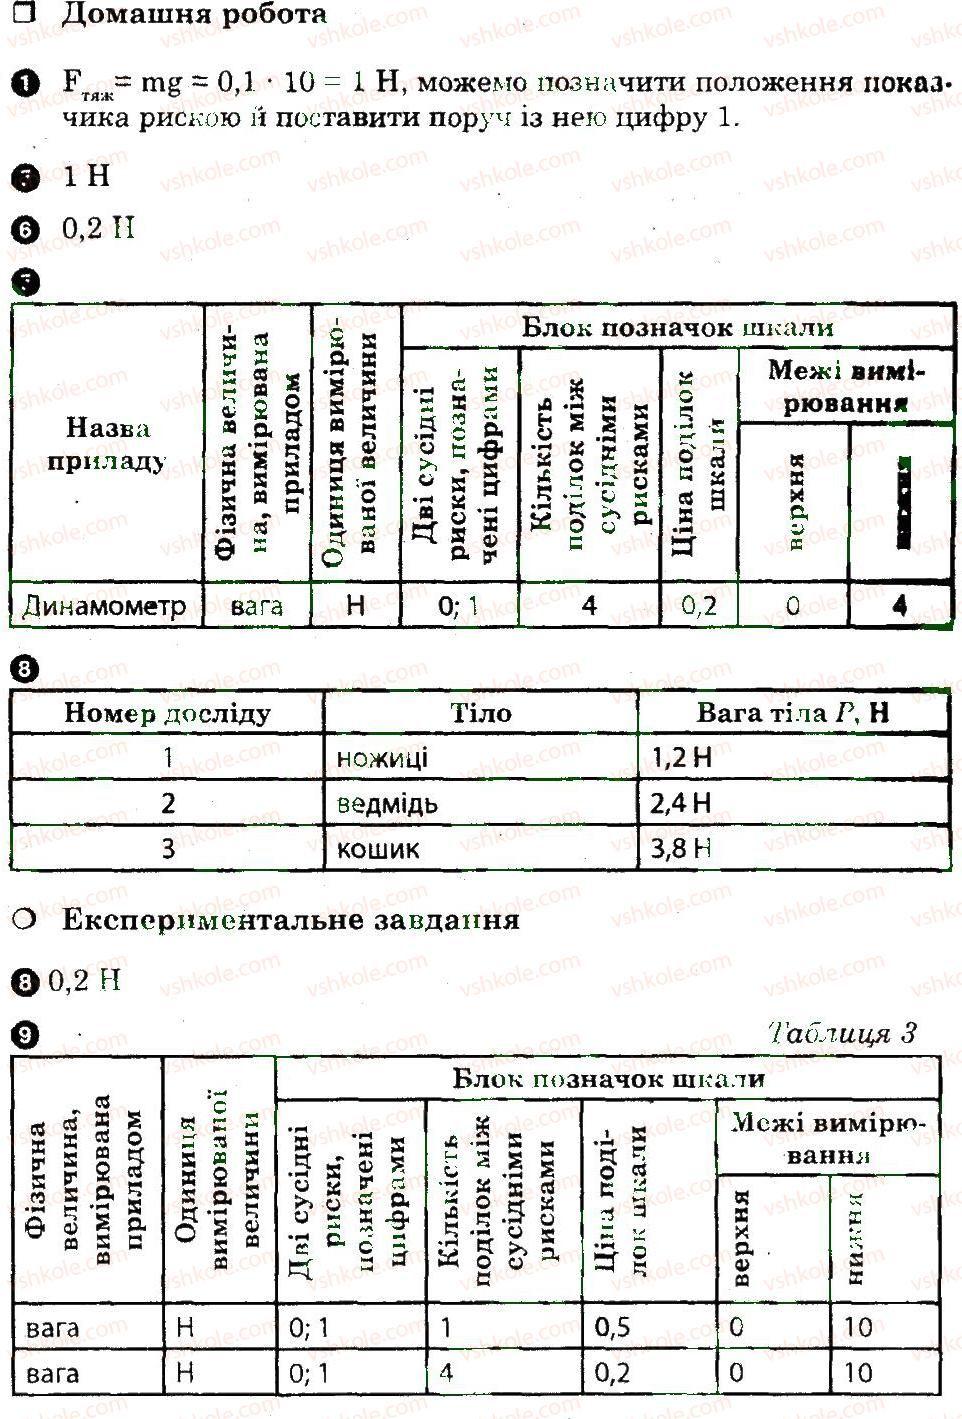 8-fizika-fya-bozhinova-oo-kiryuhina-2010-zoshit-dlya-laboratornih-robit--laboratorni-roboti-5-6-rnd8723.jpg